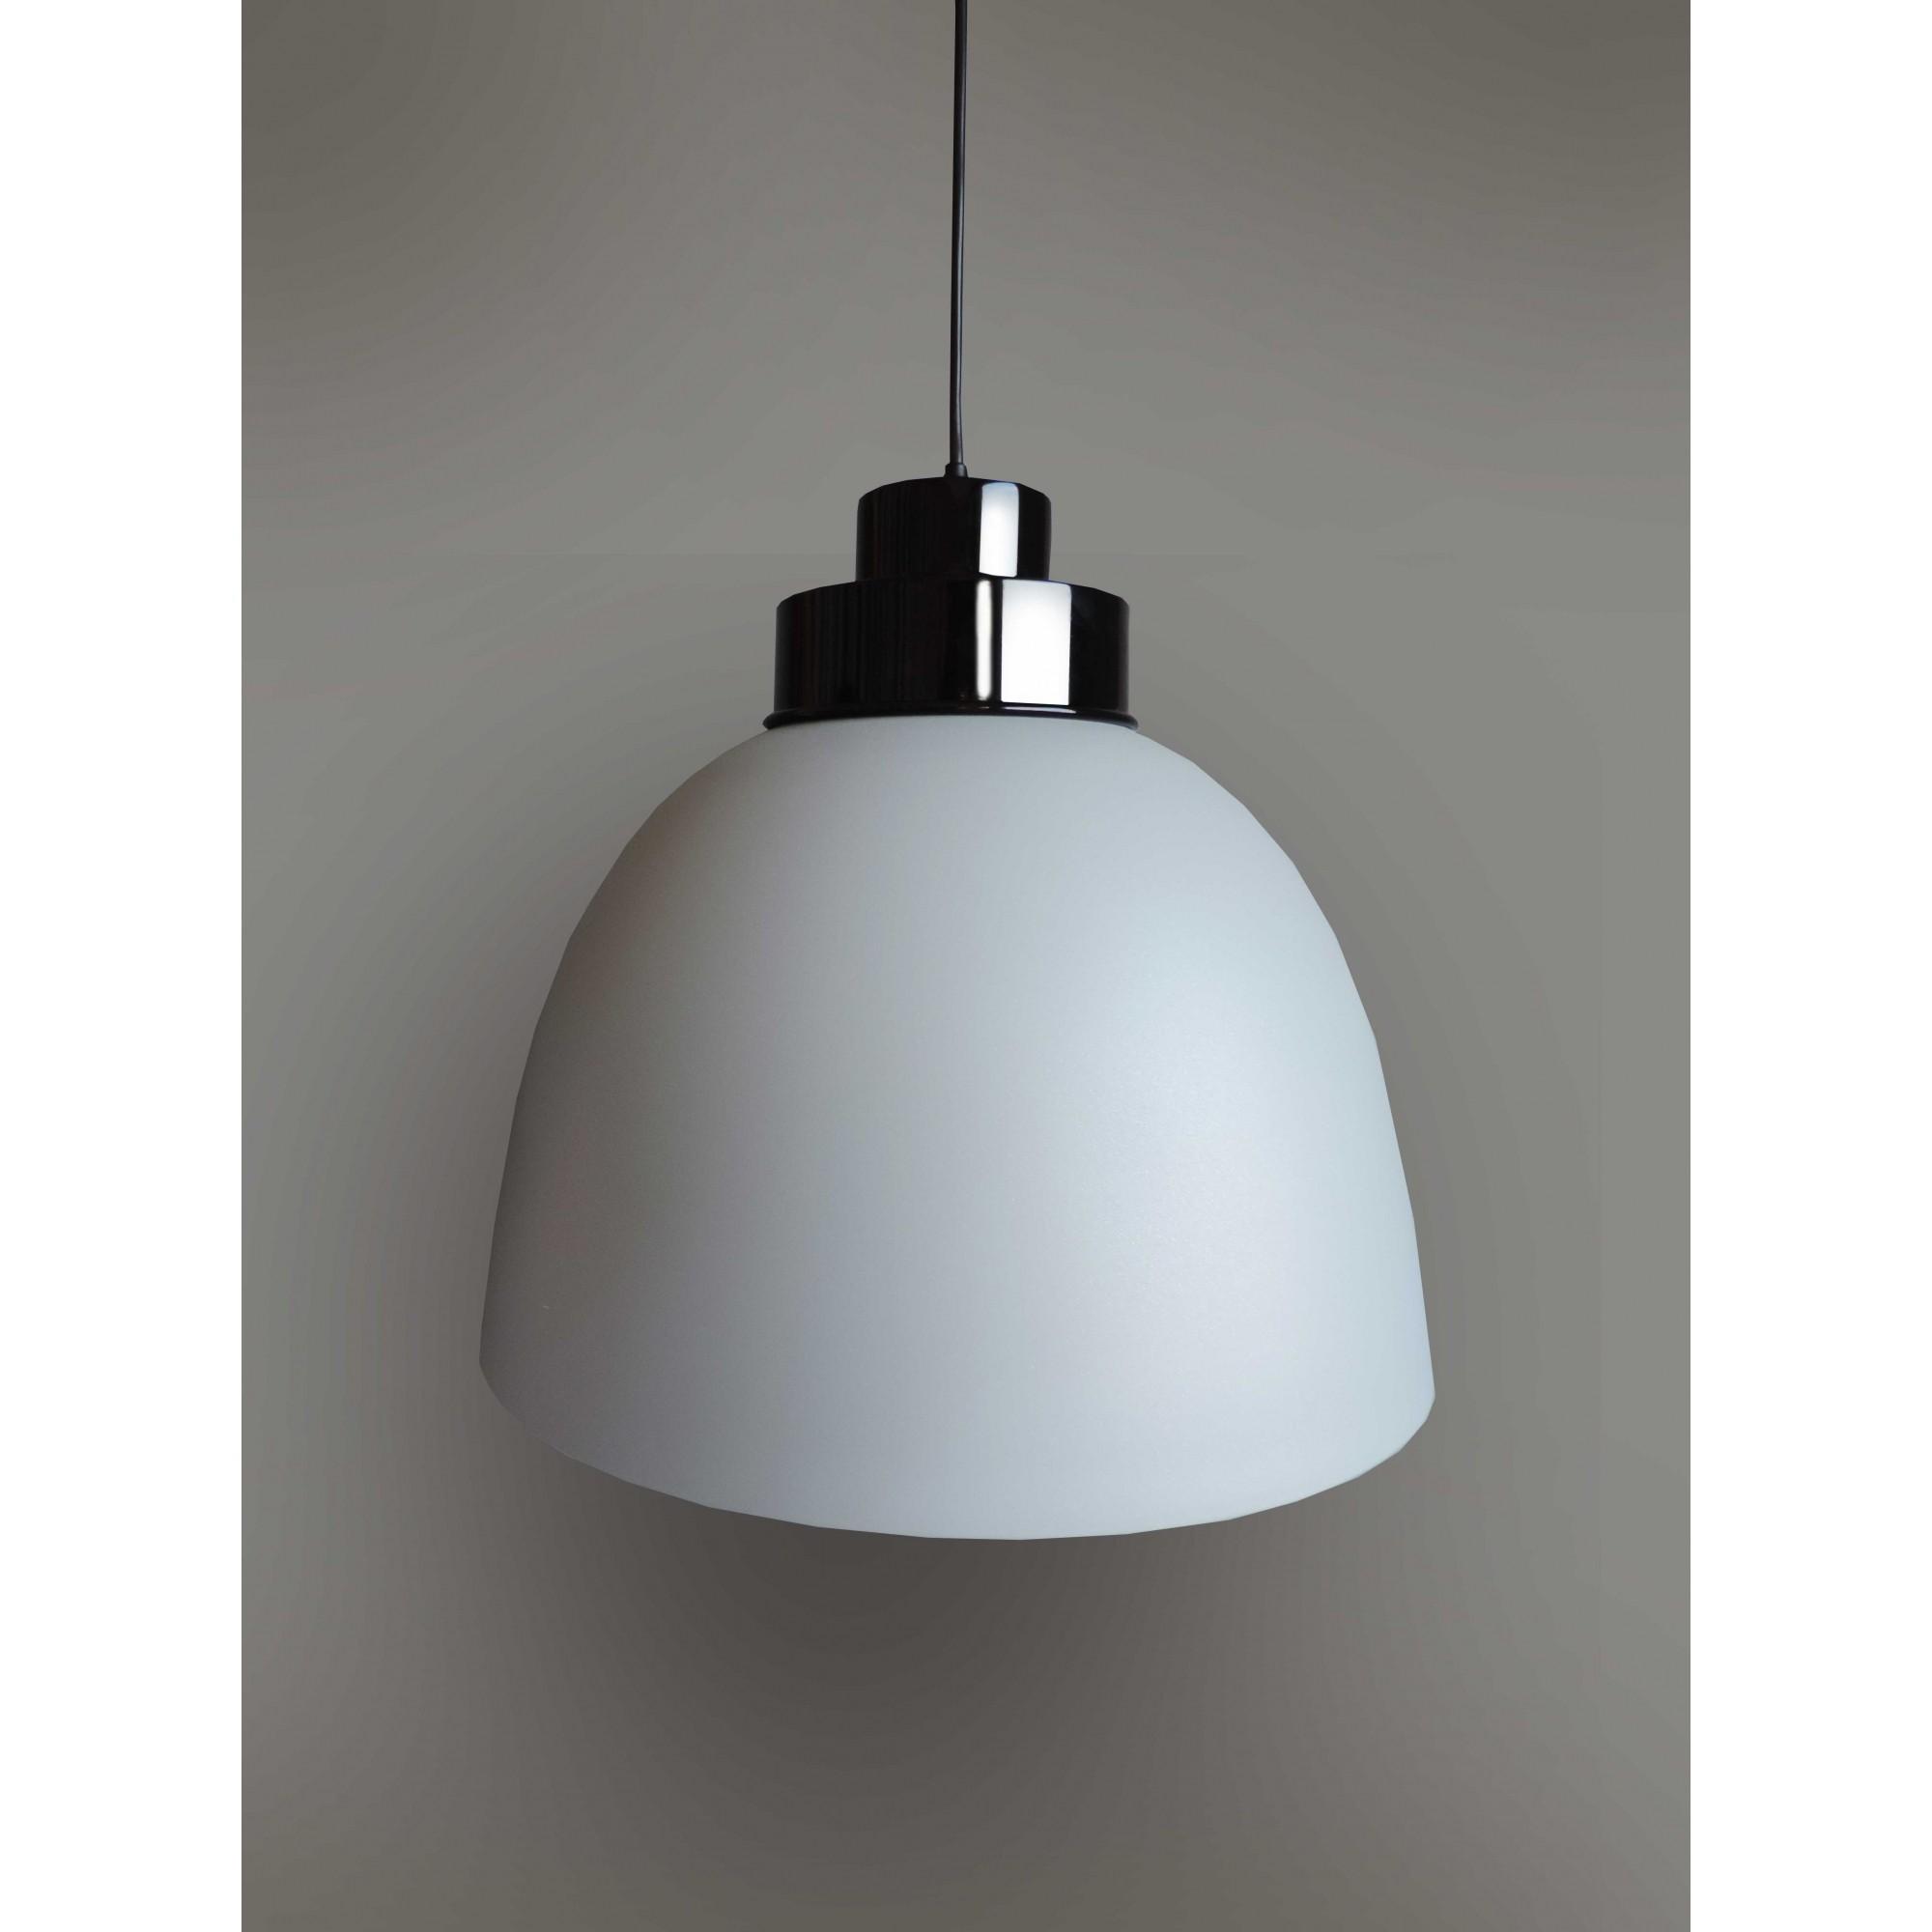 Pendente lustre Industrial Mônaco G fendi Ø40cm x 36cm